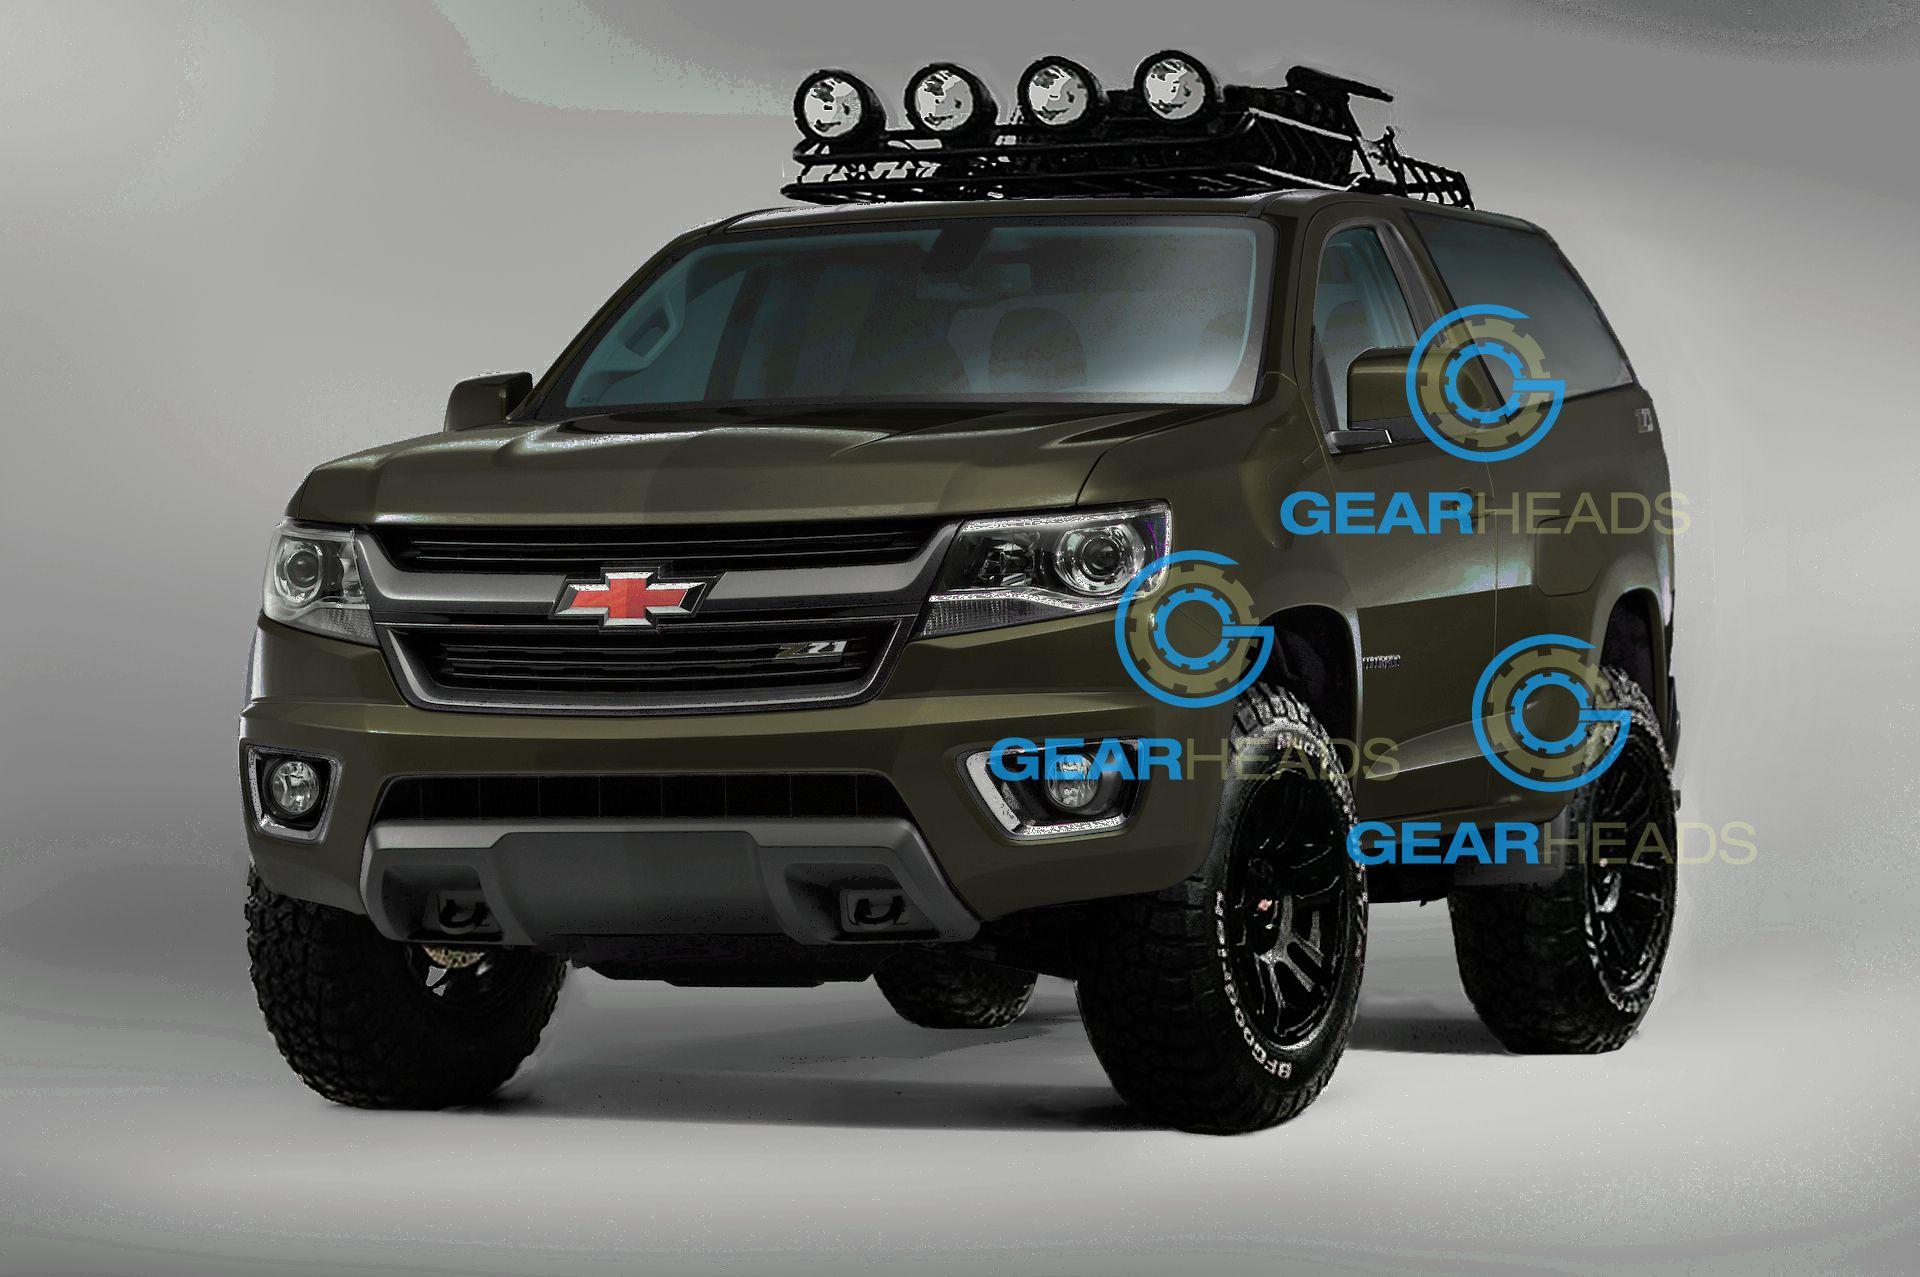 2016 Chevy Blazer K 5 Is In Your Hands Gear Heads